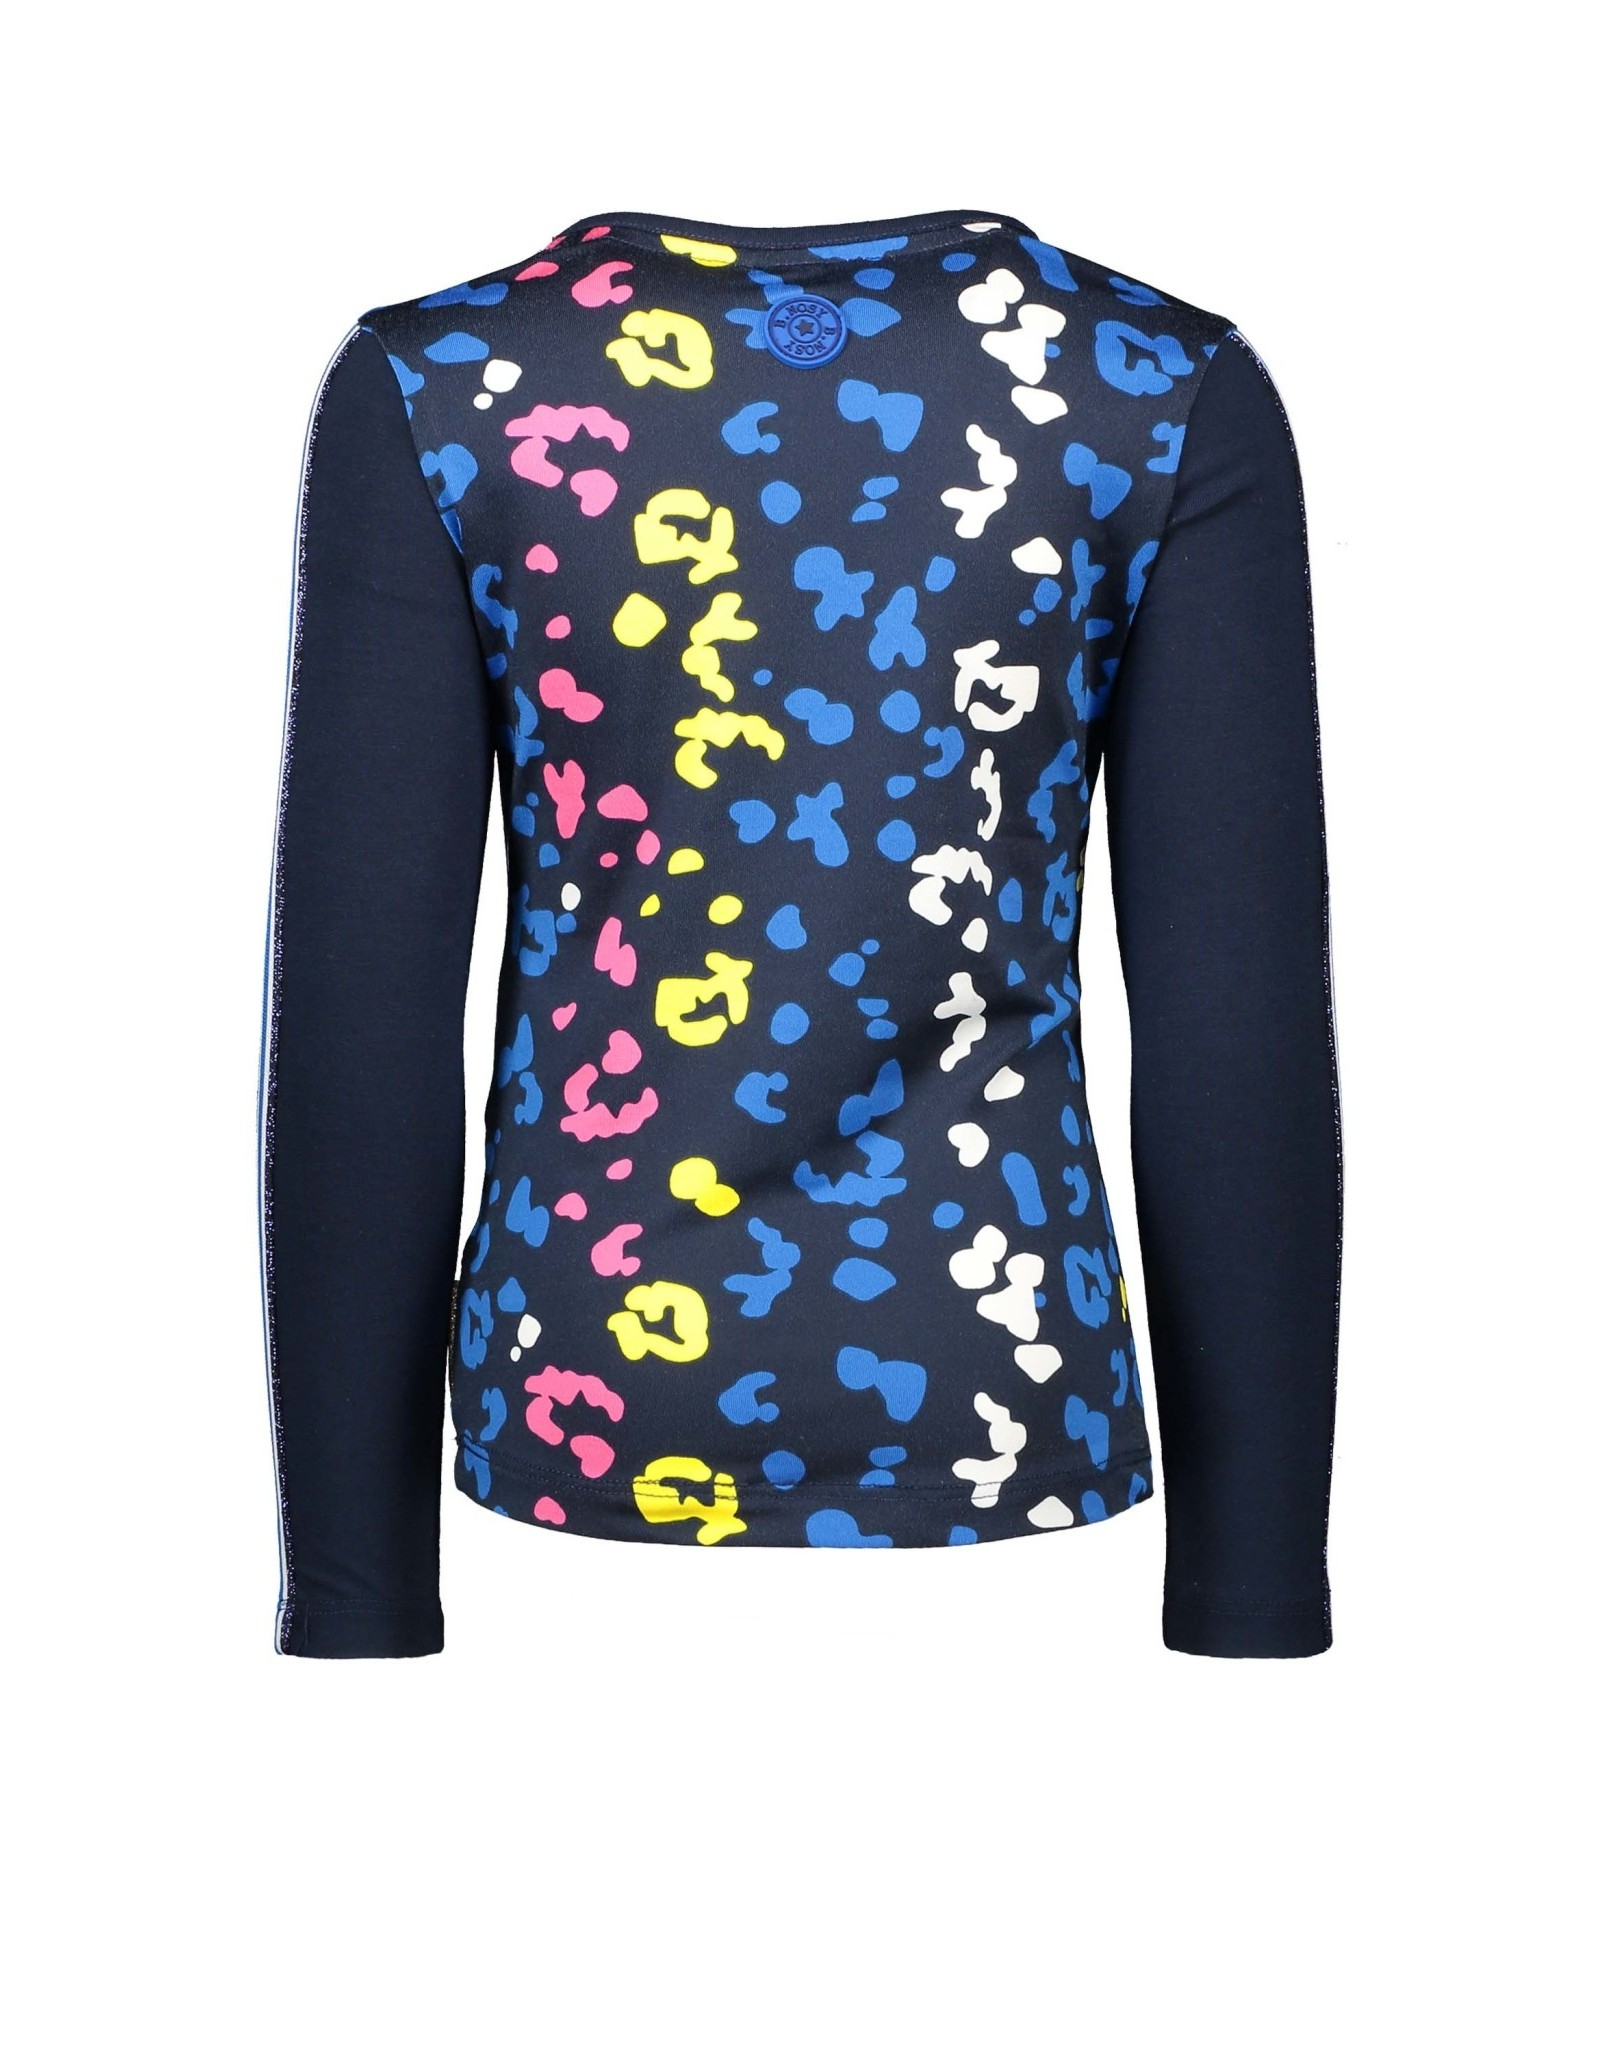 B.Nosy B.Nosy meisjes shirt met panterprint